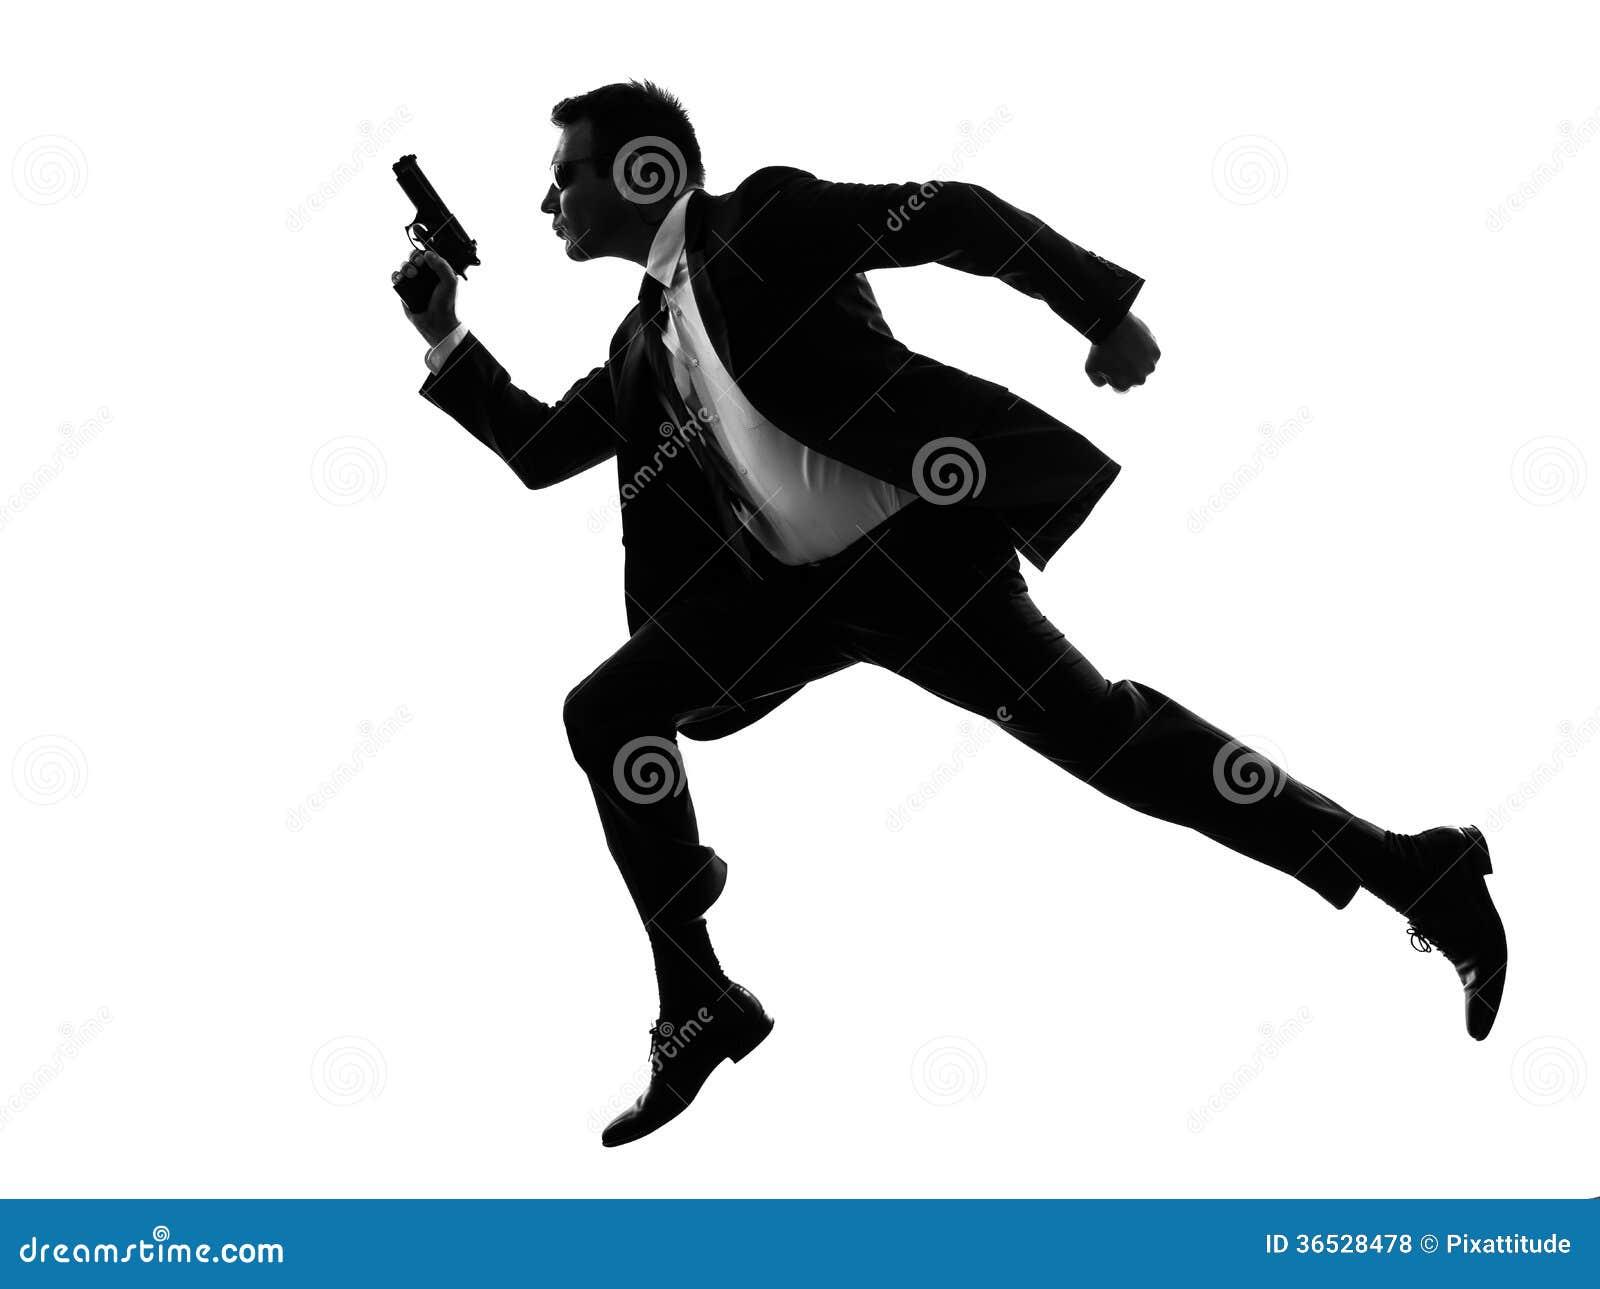 Running Man In Suit Silhouette Man with handgun running